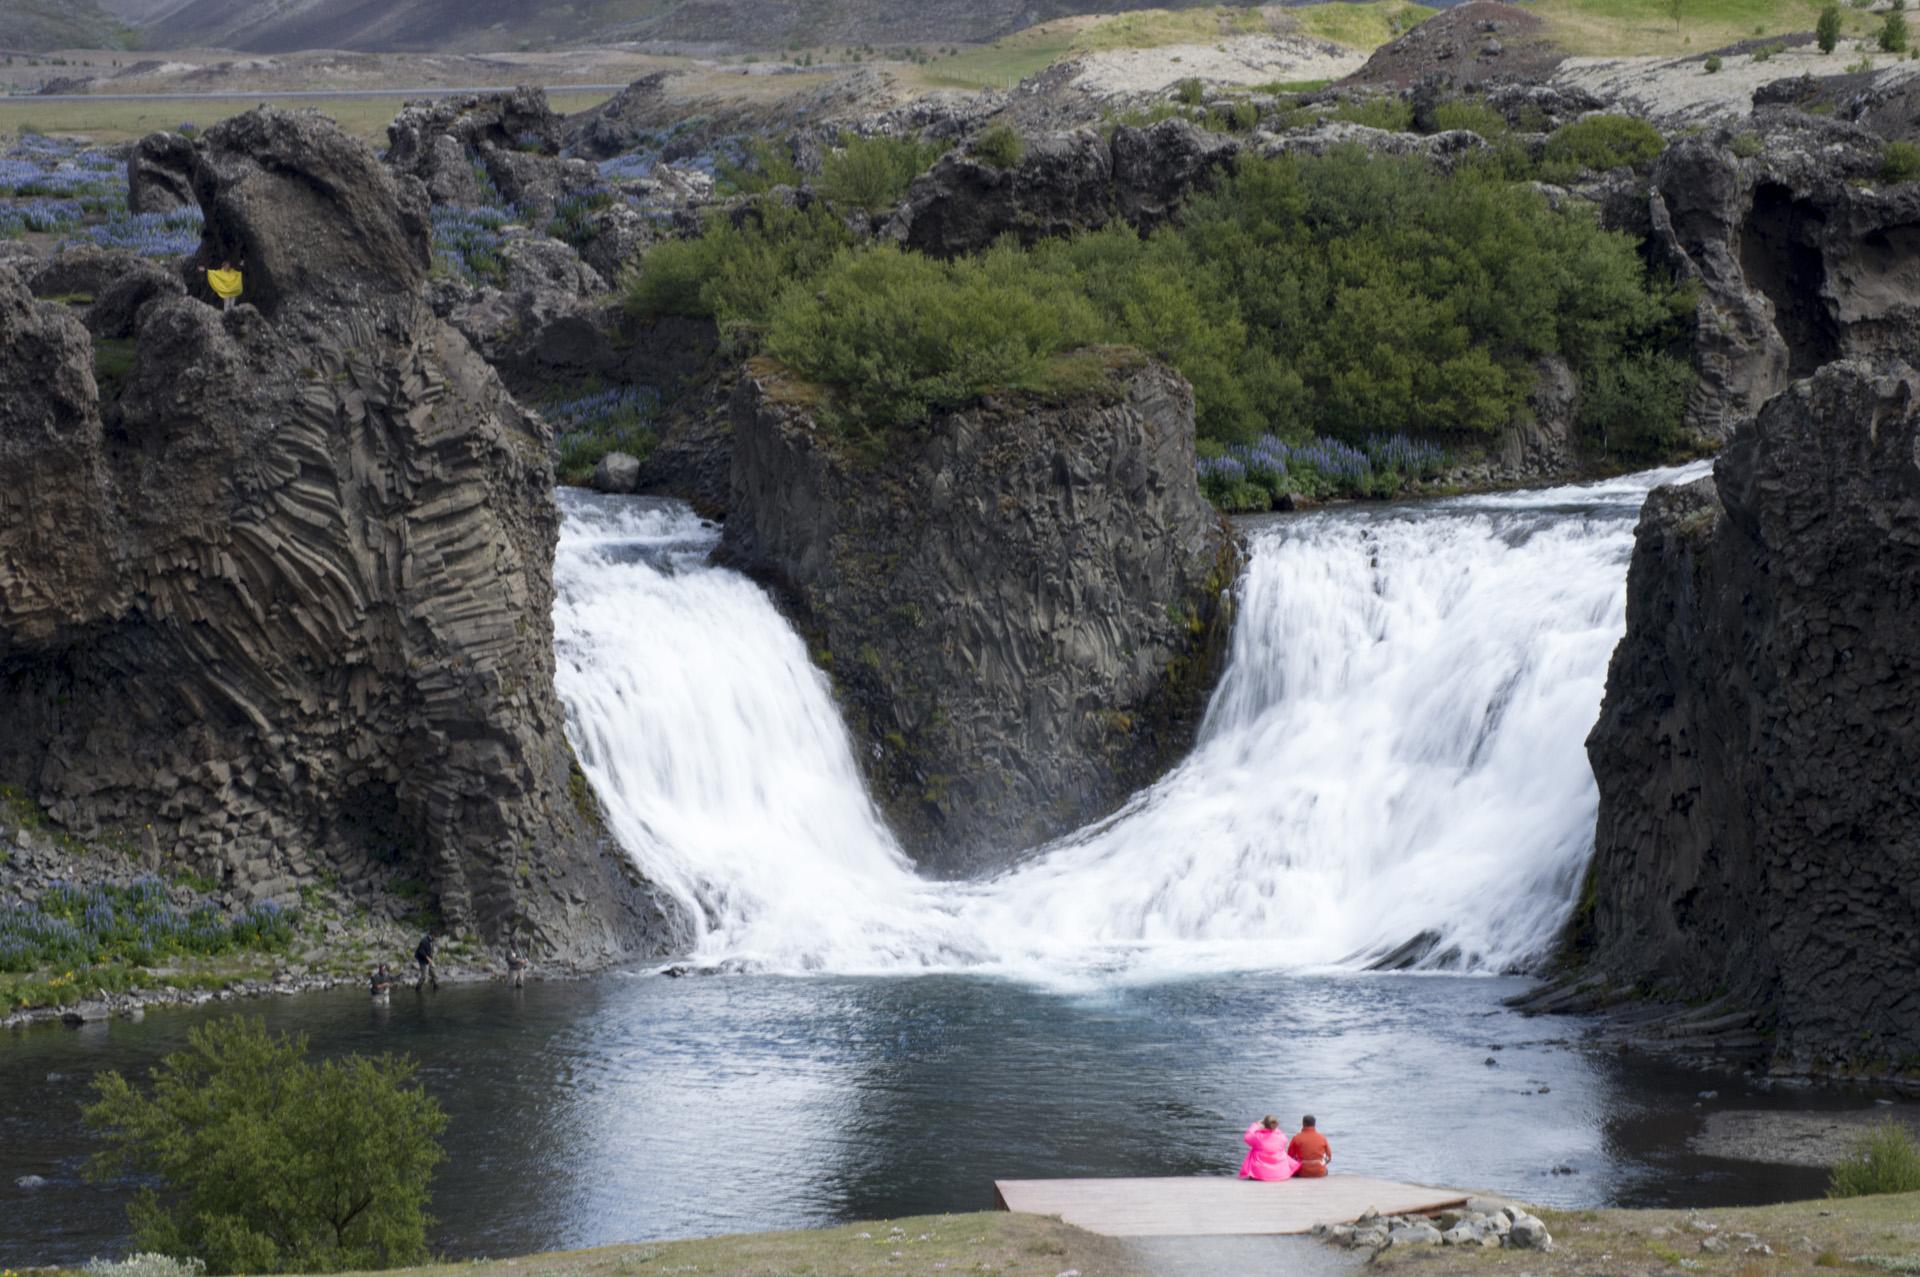 Hjalparfoss waterfall, Suðurland region, Iceland.